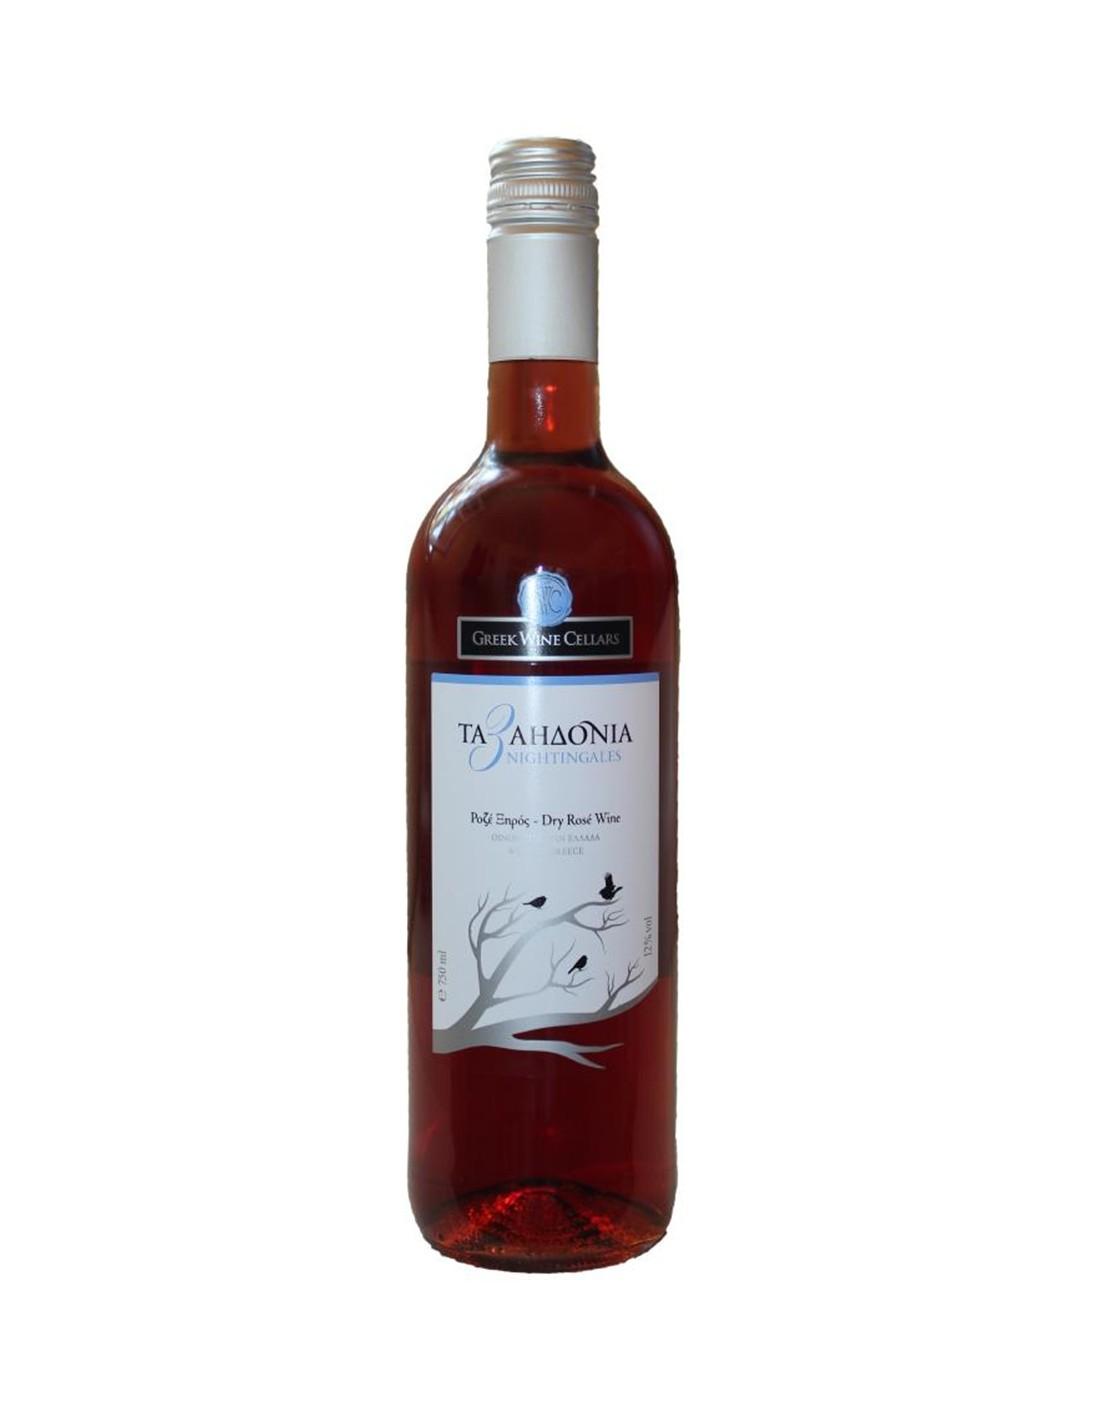 Vin roze Sec, 3 Nightingales Nemea, 0.75L, Grecia